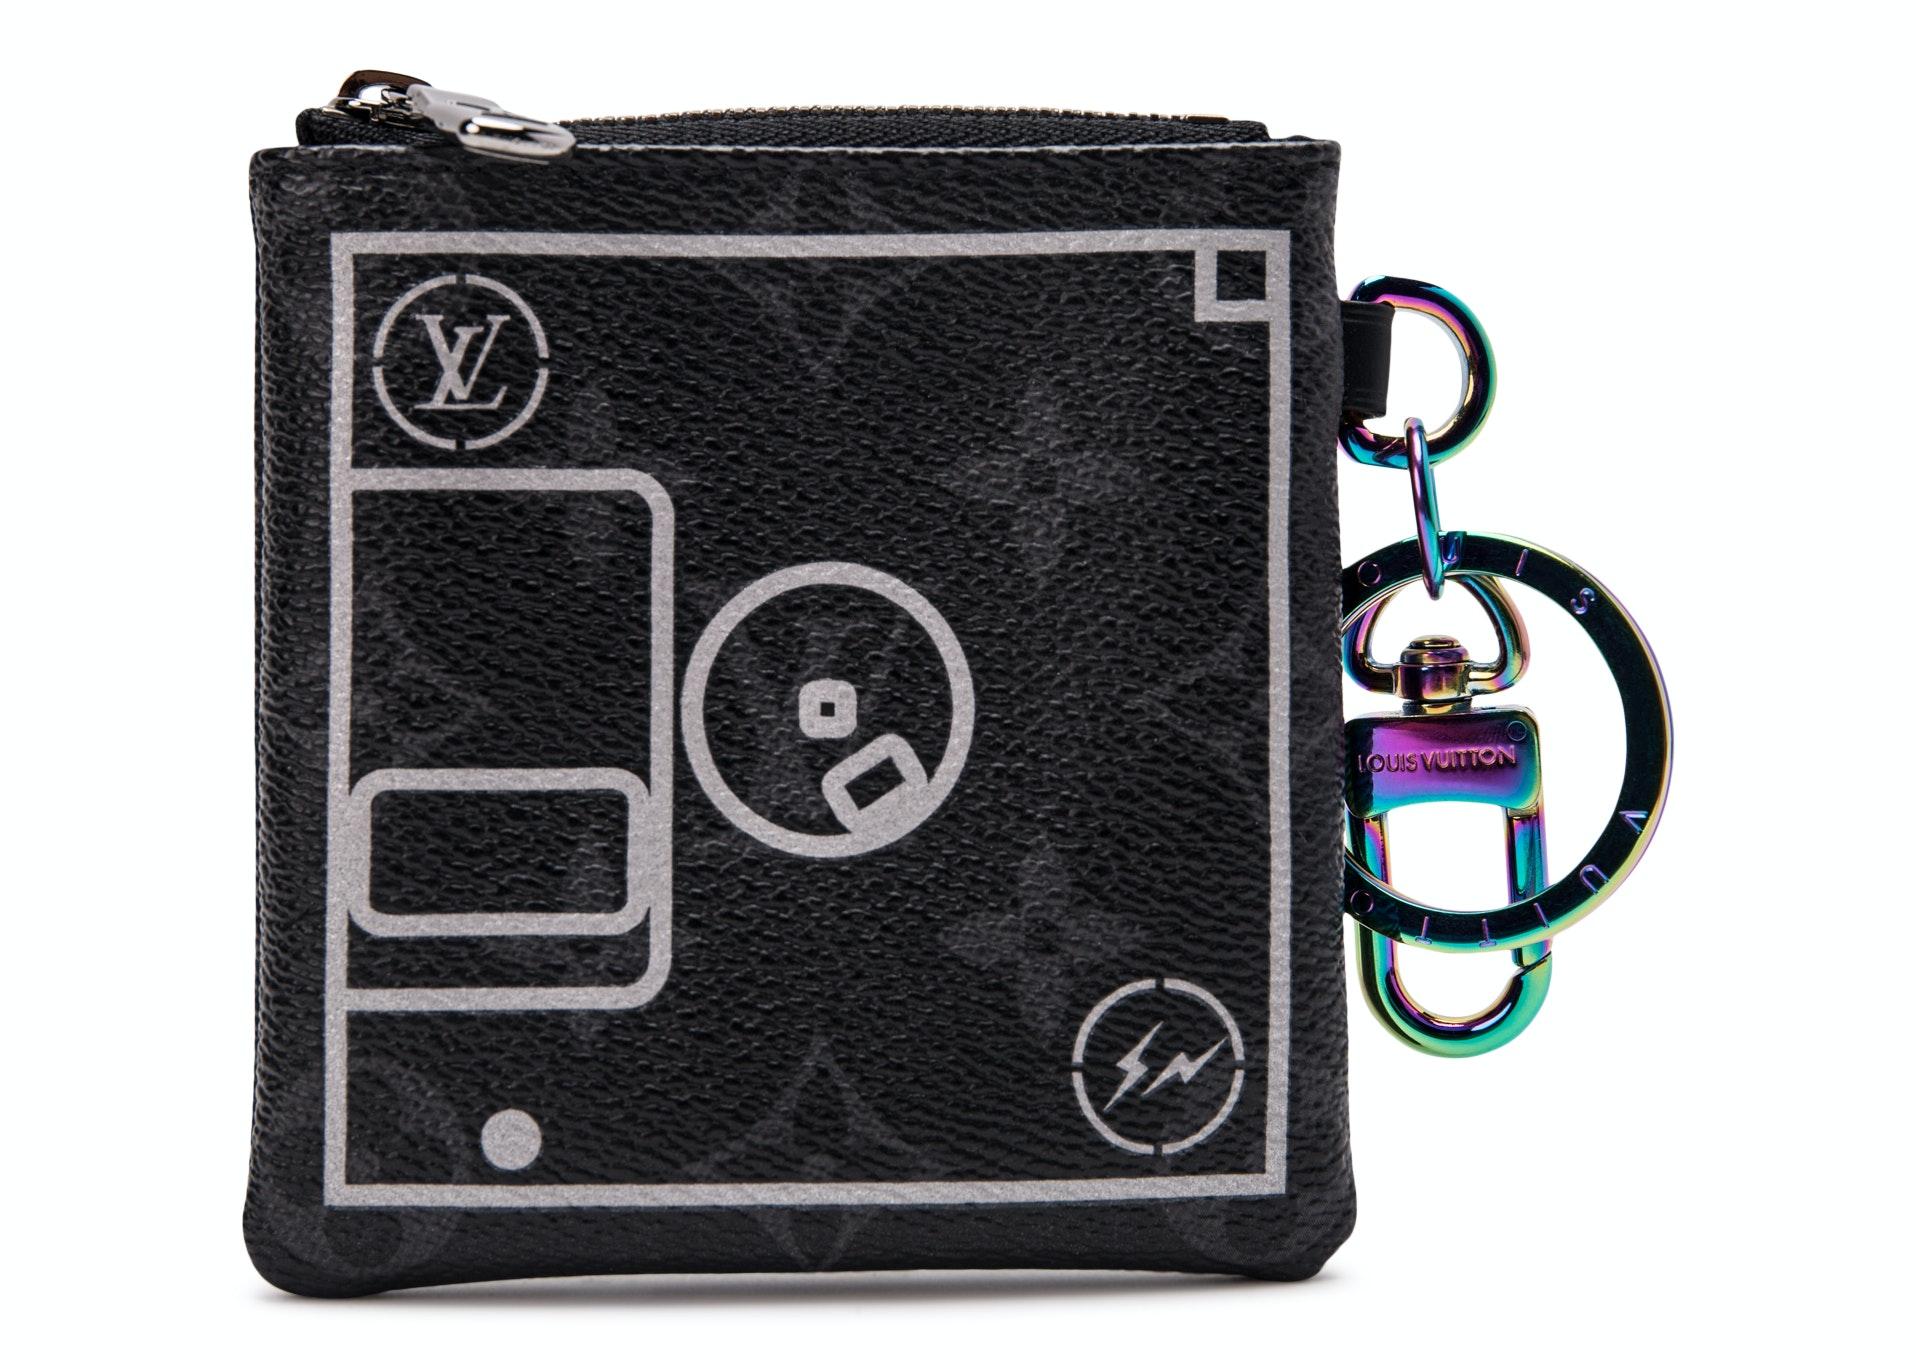 Louis Vuitton x Fragment Small Purse Monogram Eclipse Black